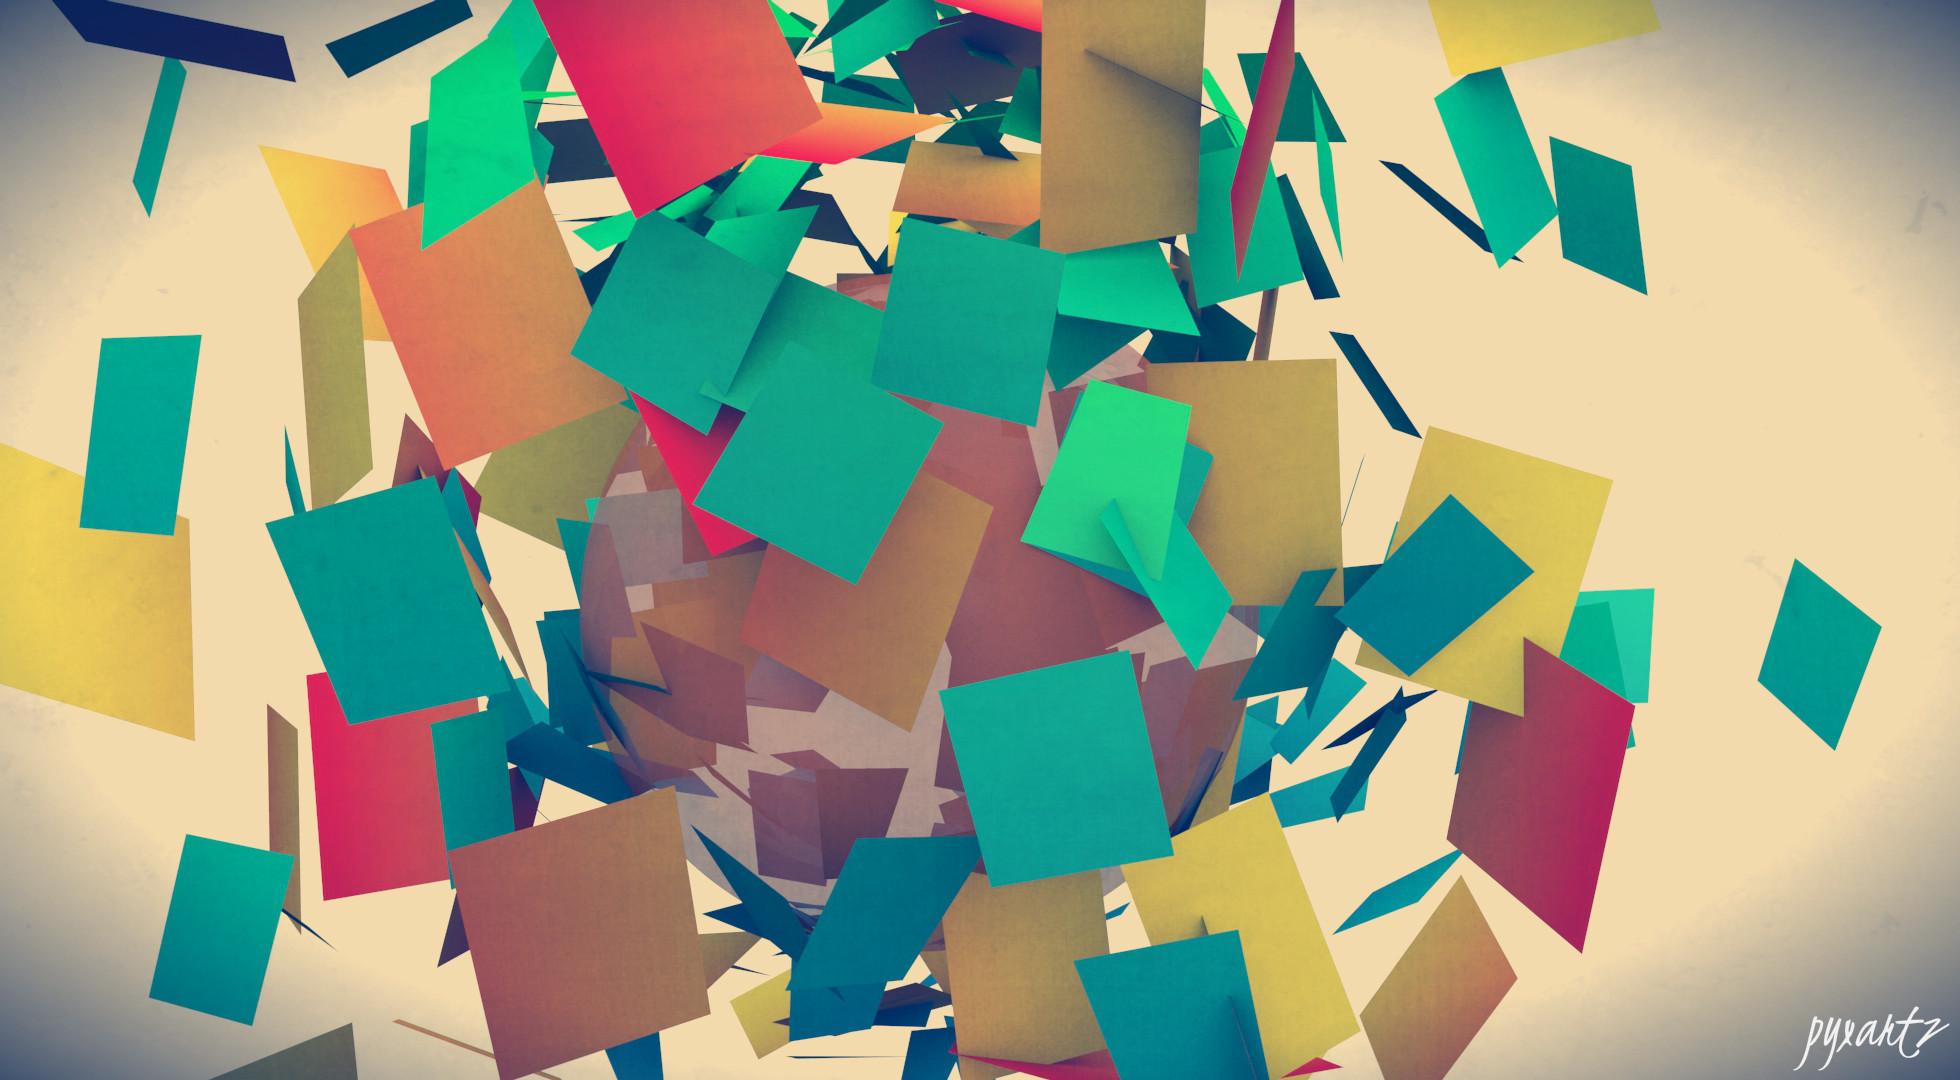 Abstract Wallpaper #10 by pyxArtz Abstract Wallpaper #10 by pyxArtz